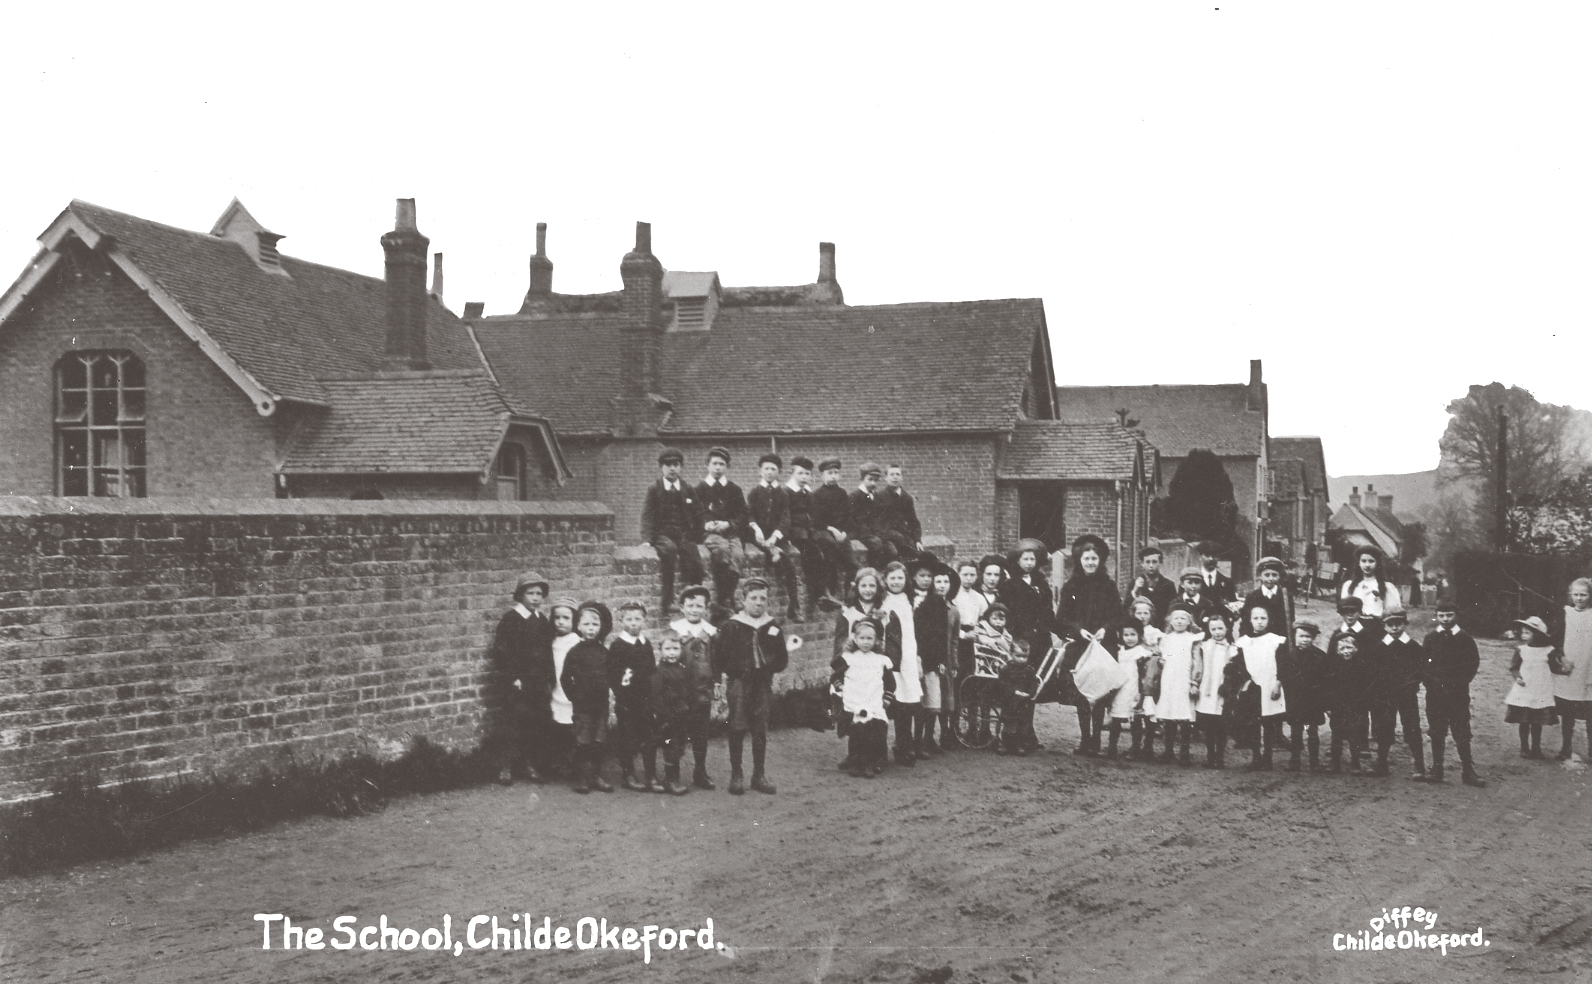 School at Childe Okeford